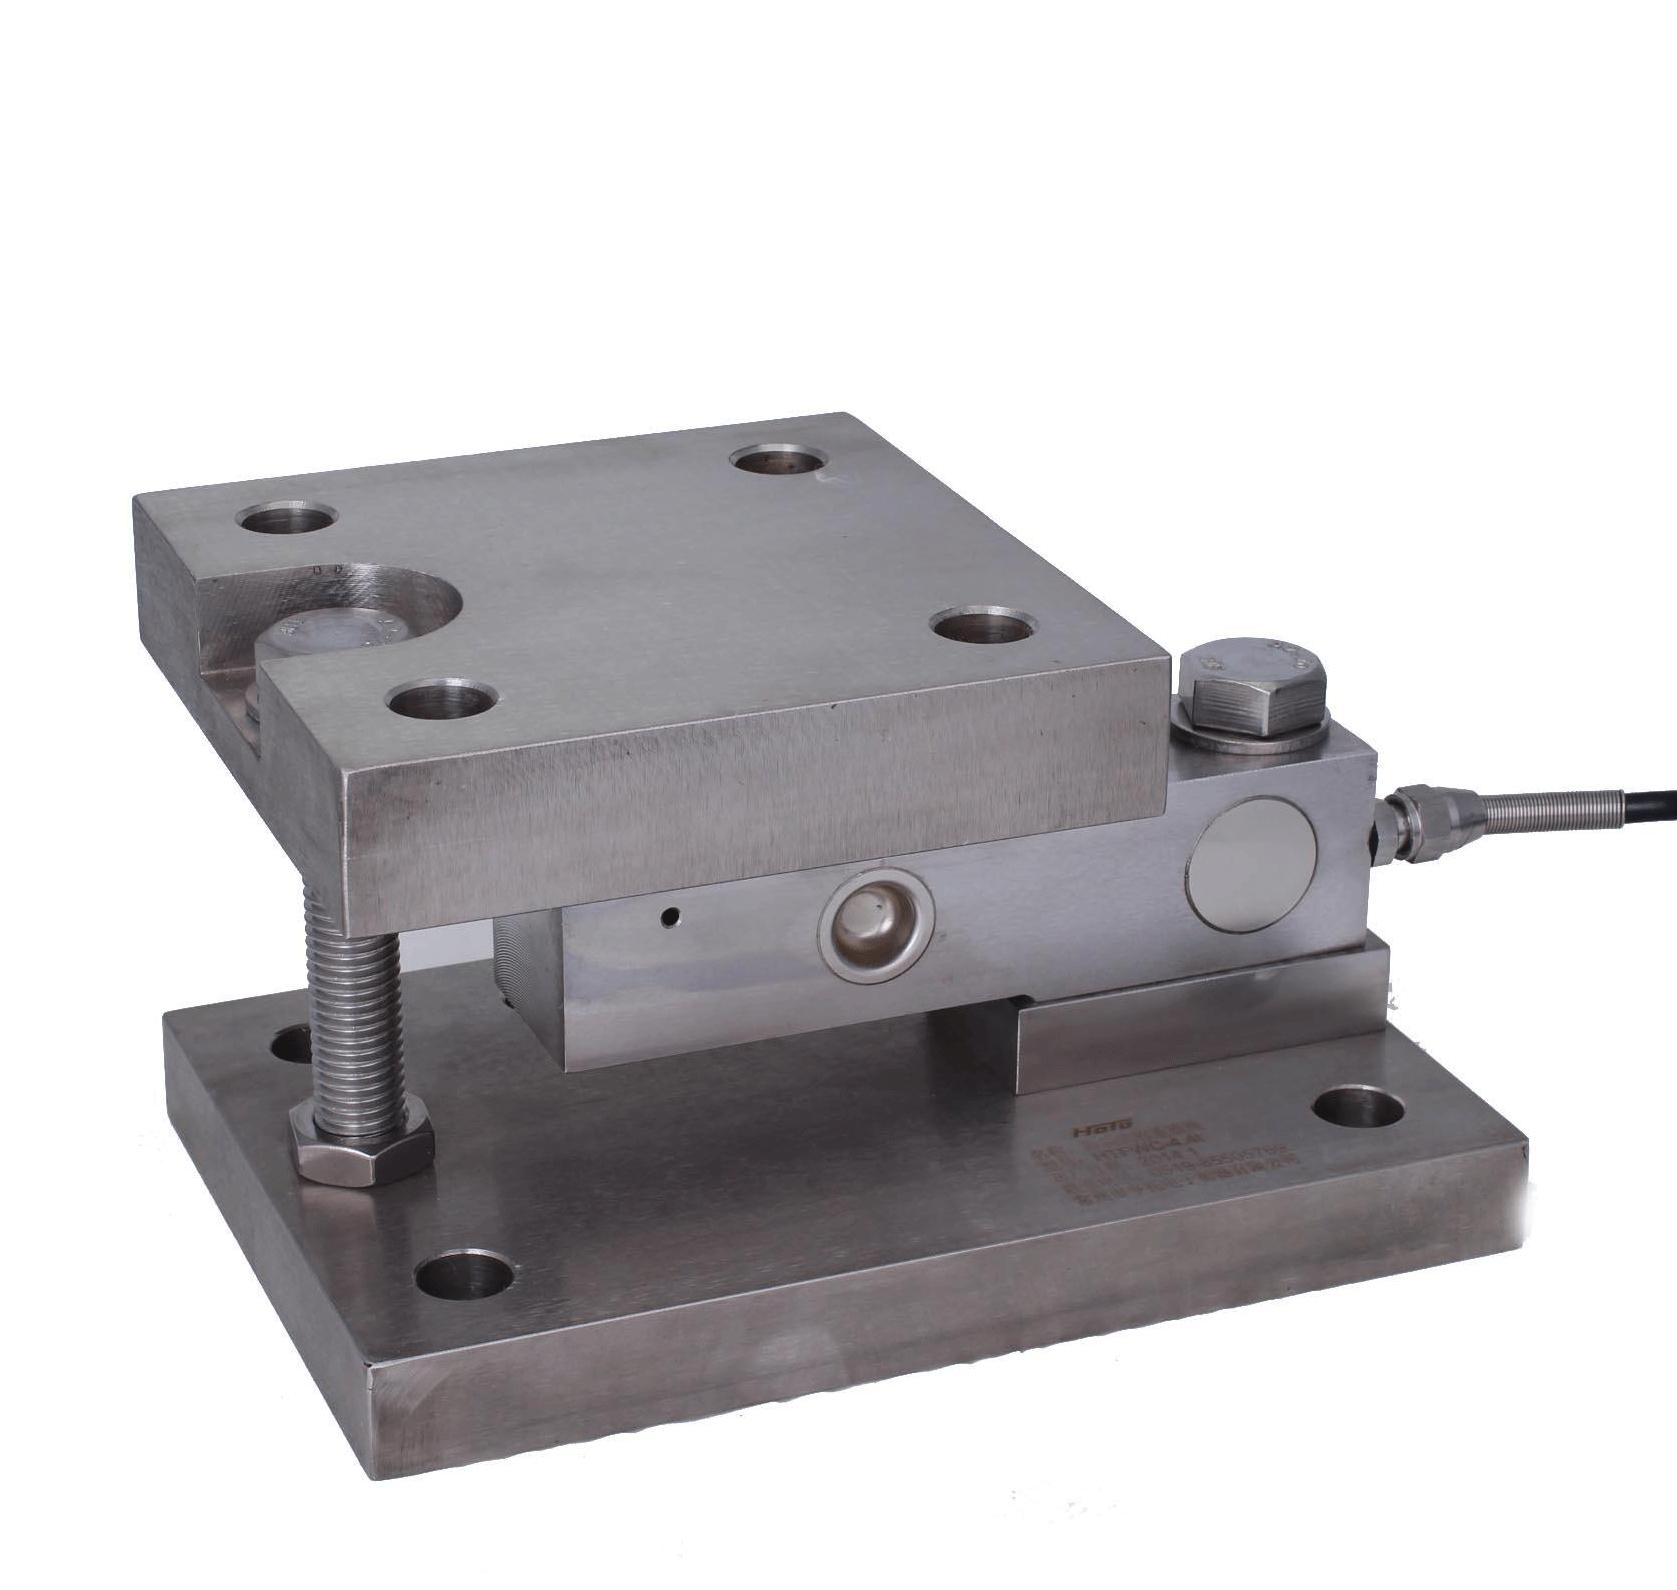 <strong>槽罐配料过程控制15t静载称重模块传感器</strong>